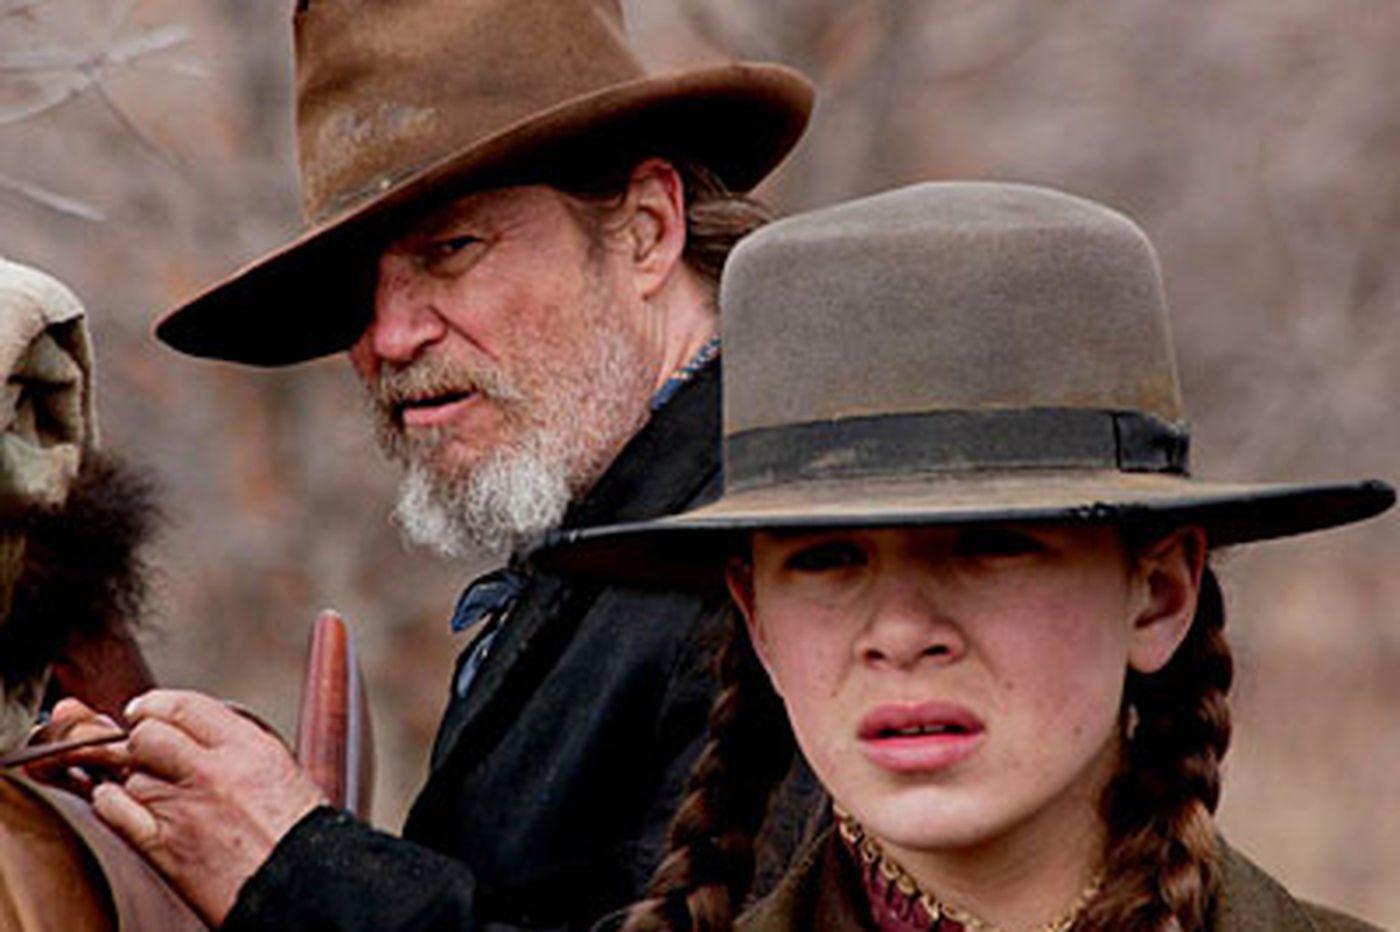 'True Grit,' the Coens' wry biblical western